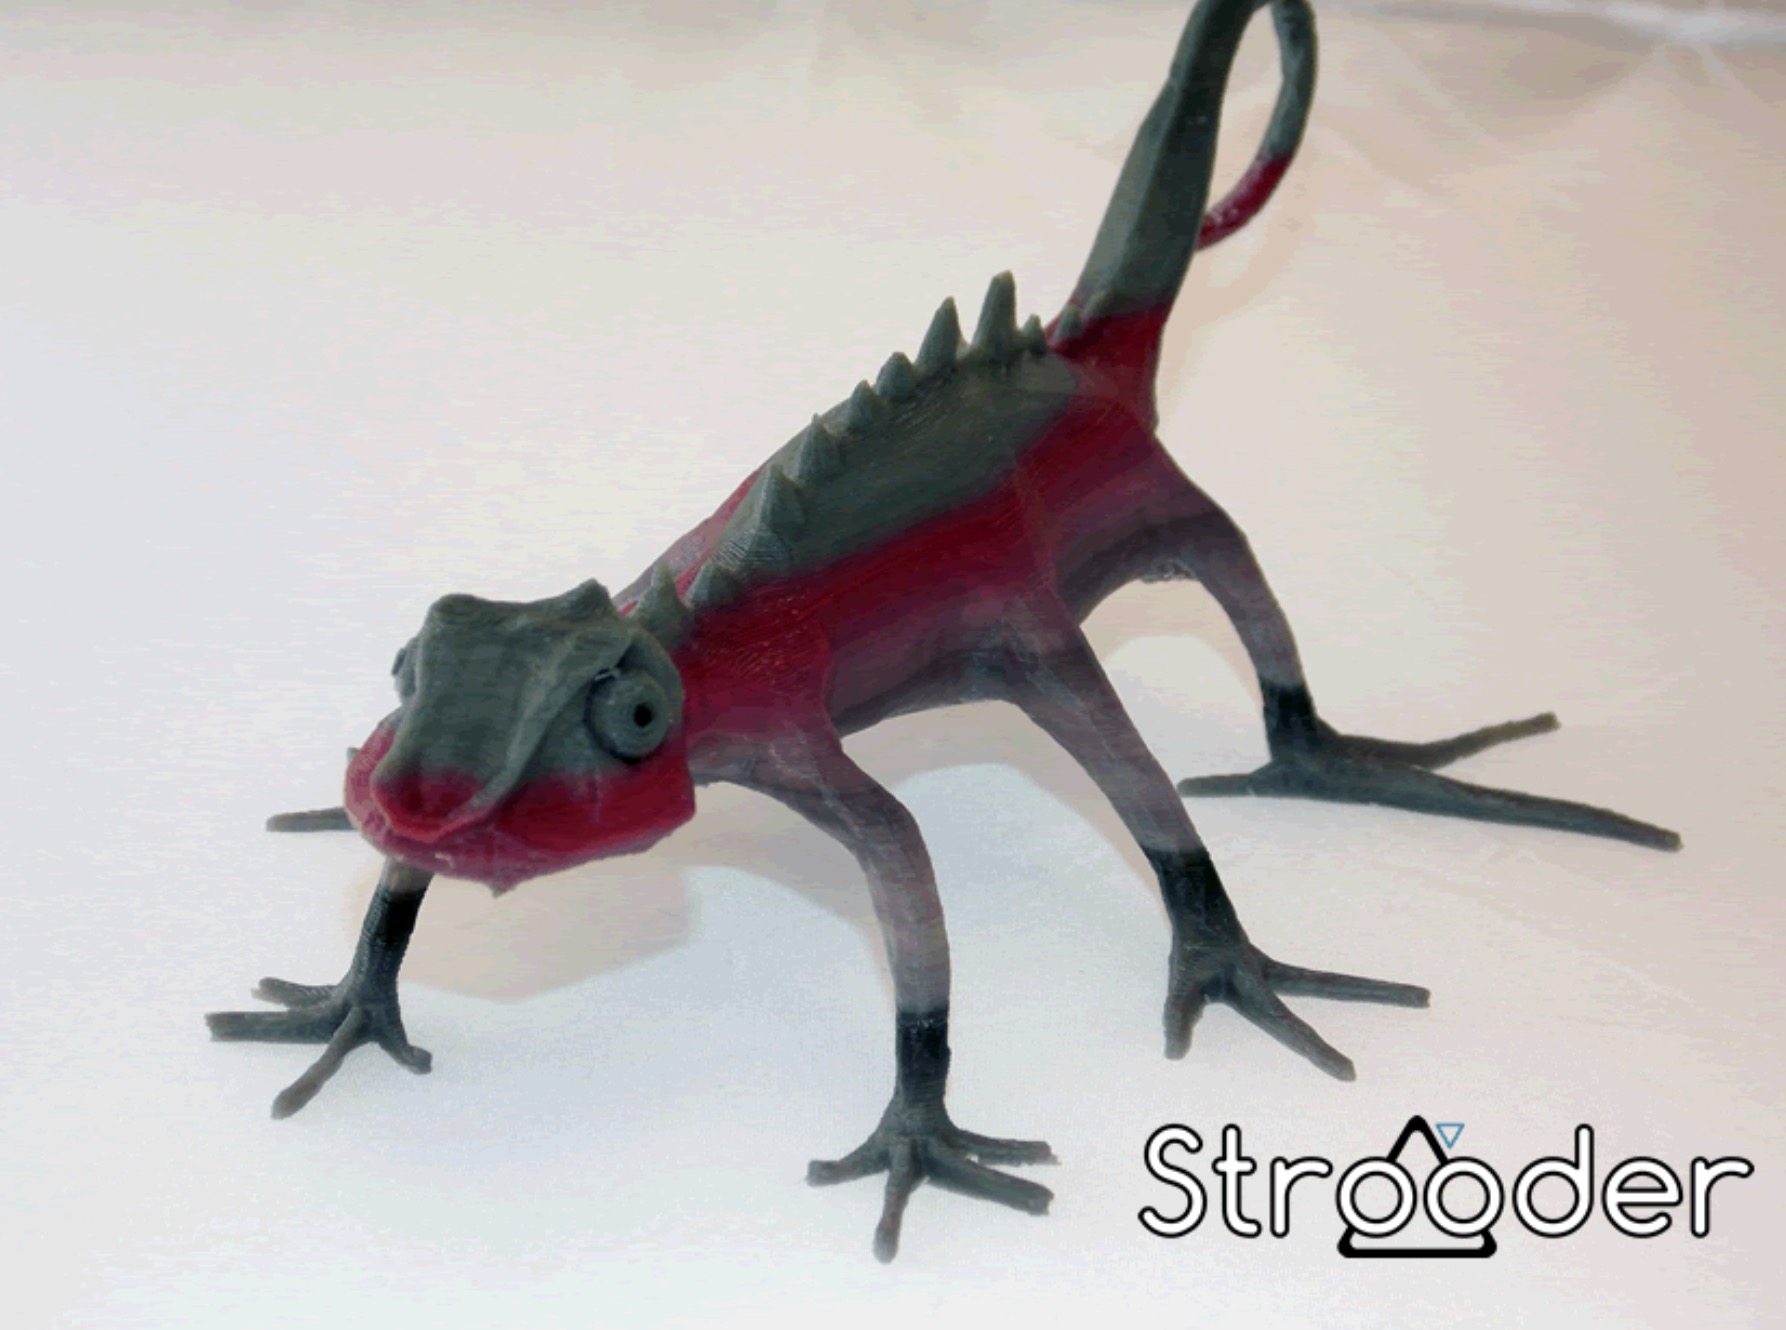 Strooder Carma